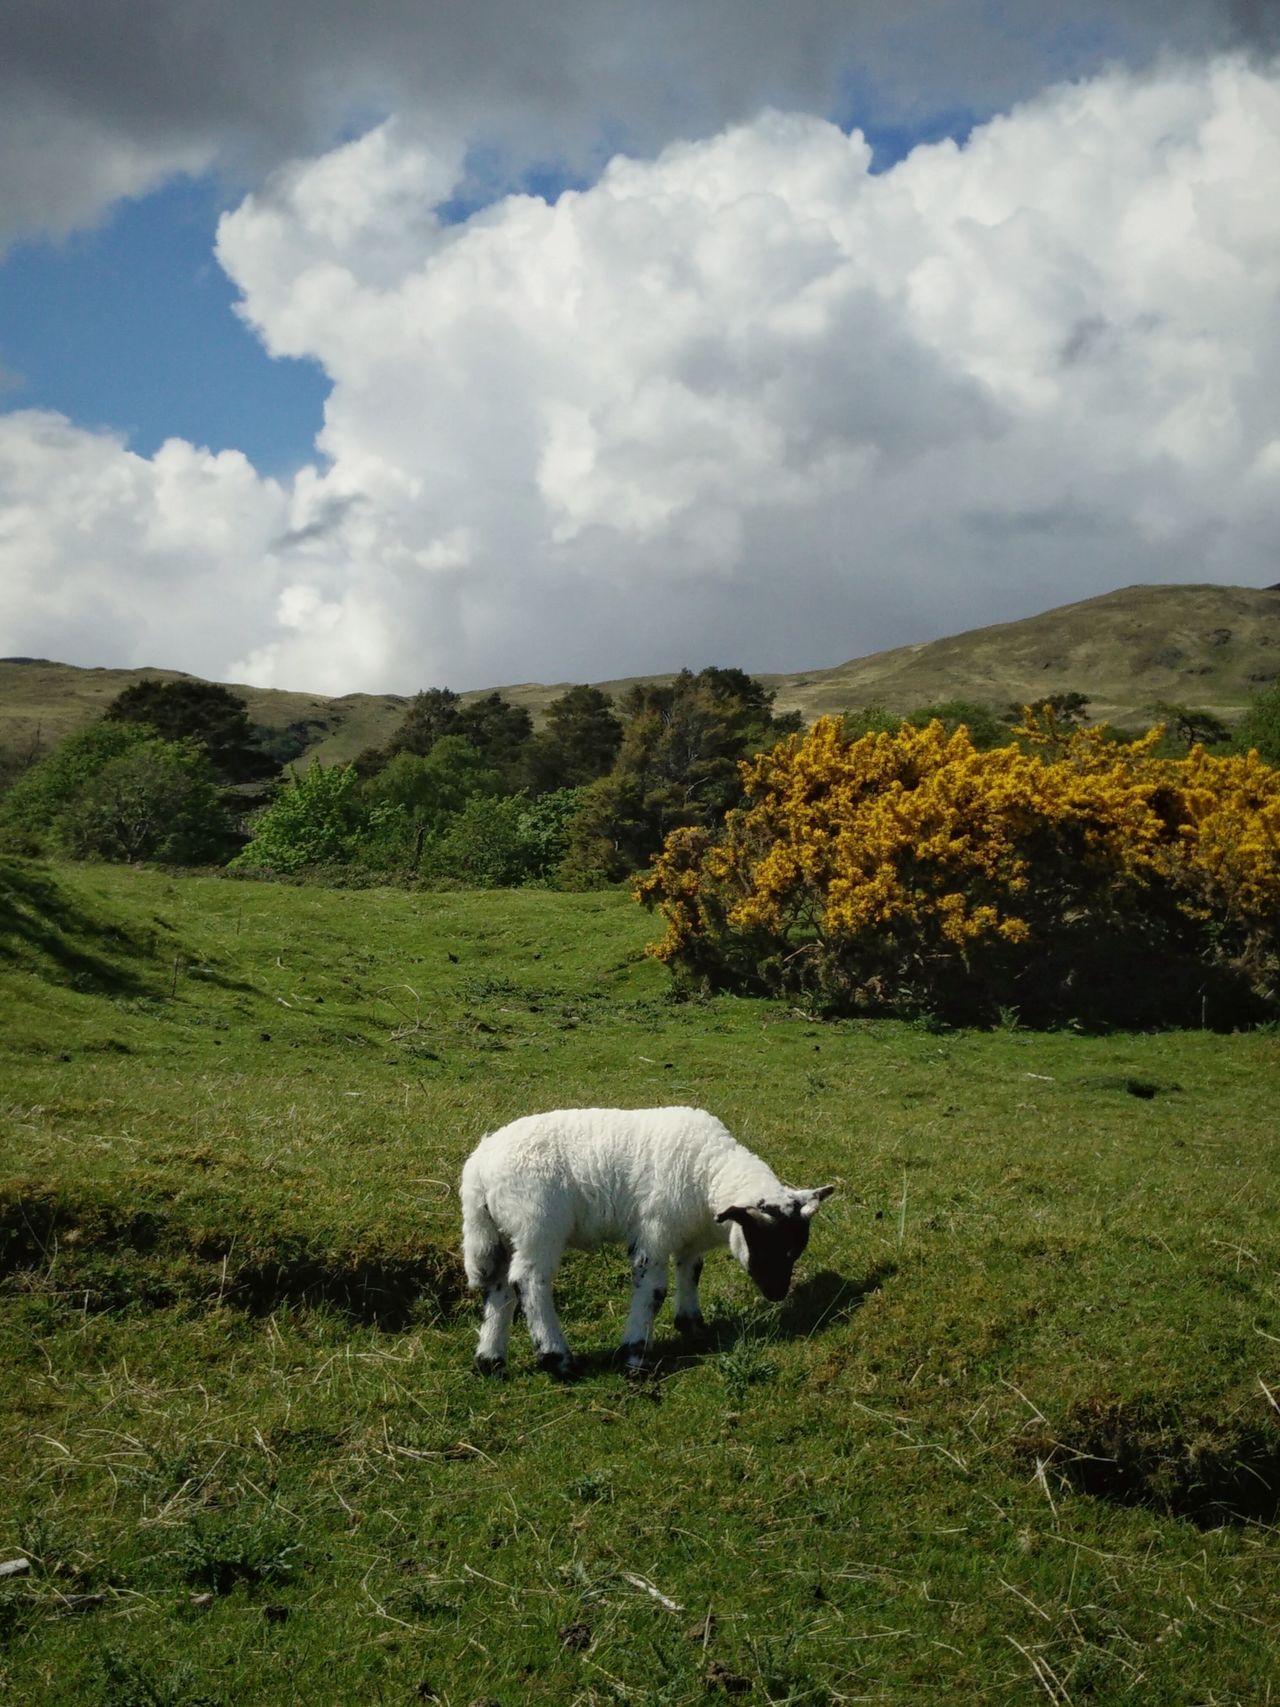 Animal Themes Beauty In Nature Domestic Animals Grass Grazing Landscape Nature Scotland Scottish Highlands Sheep Traveling